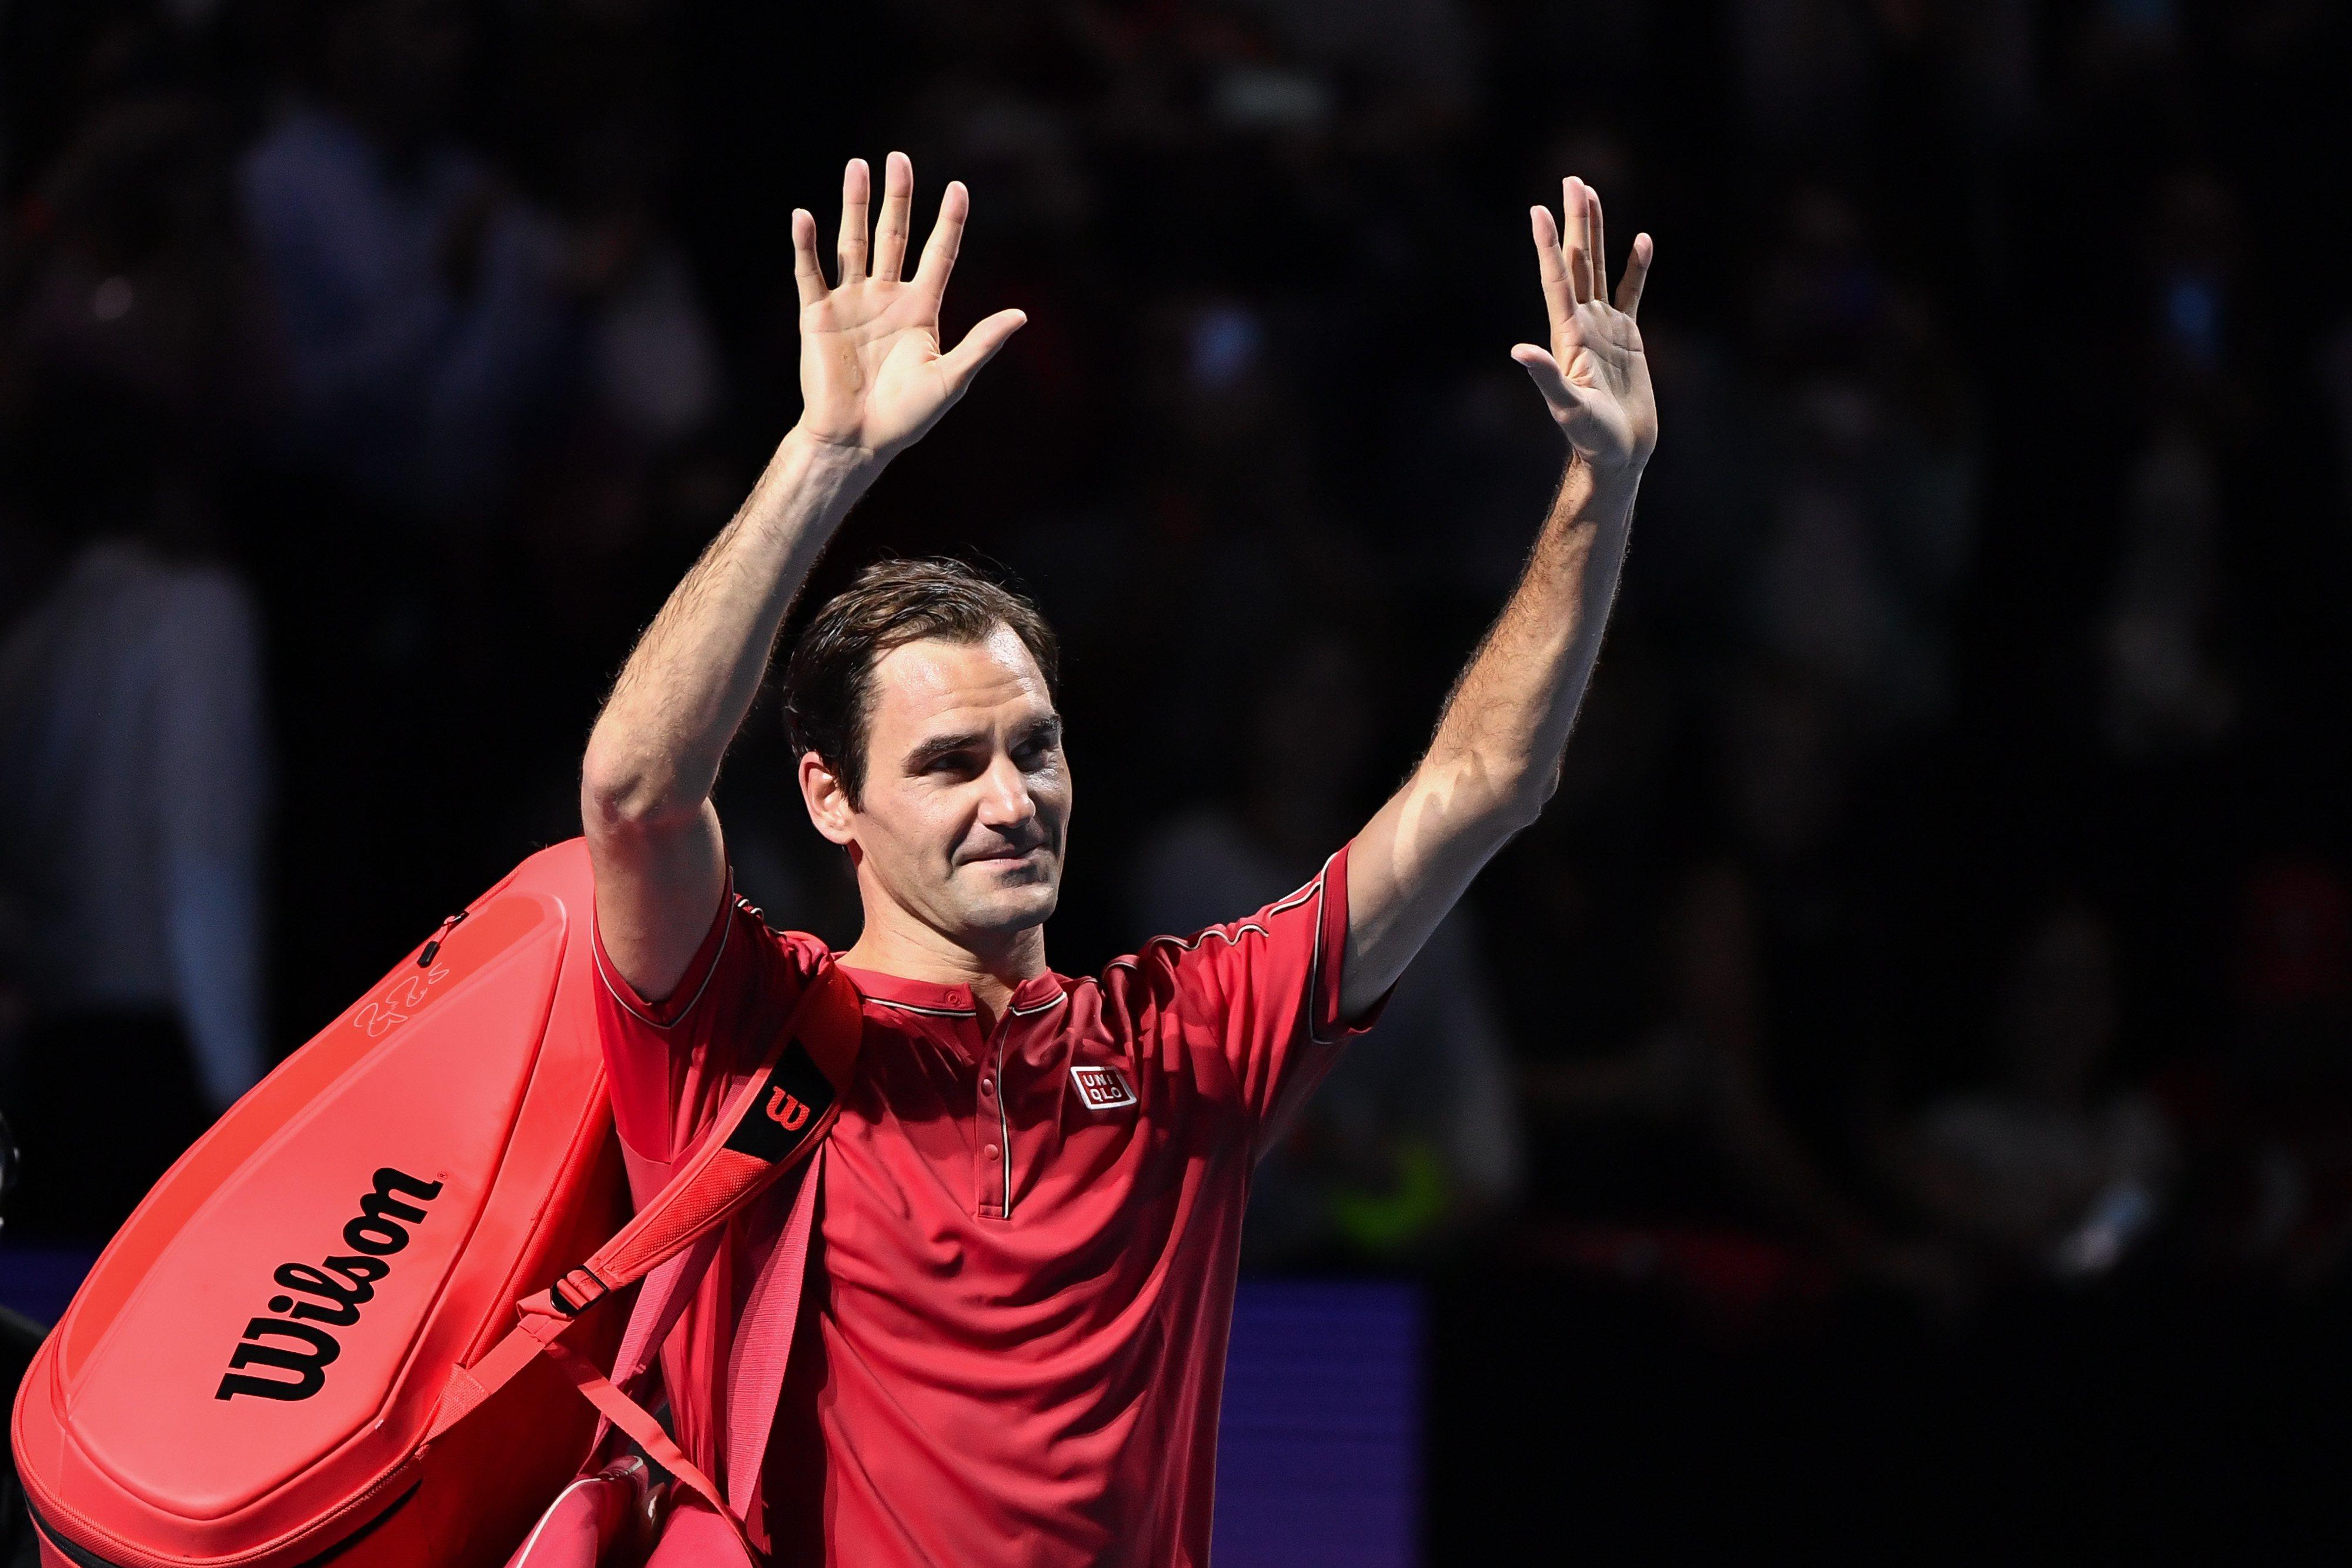 Roger Federer ujawnił plany na 2020 rok